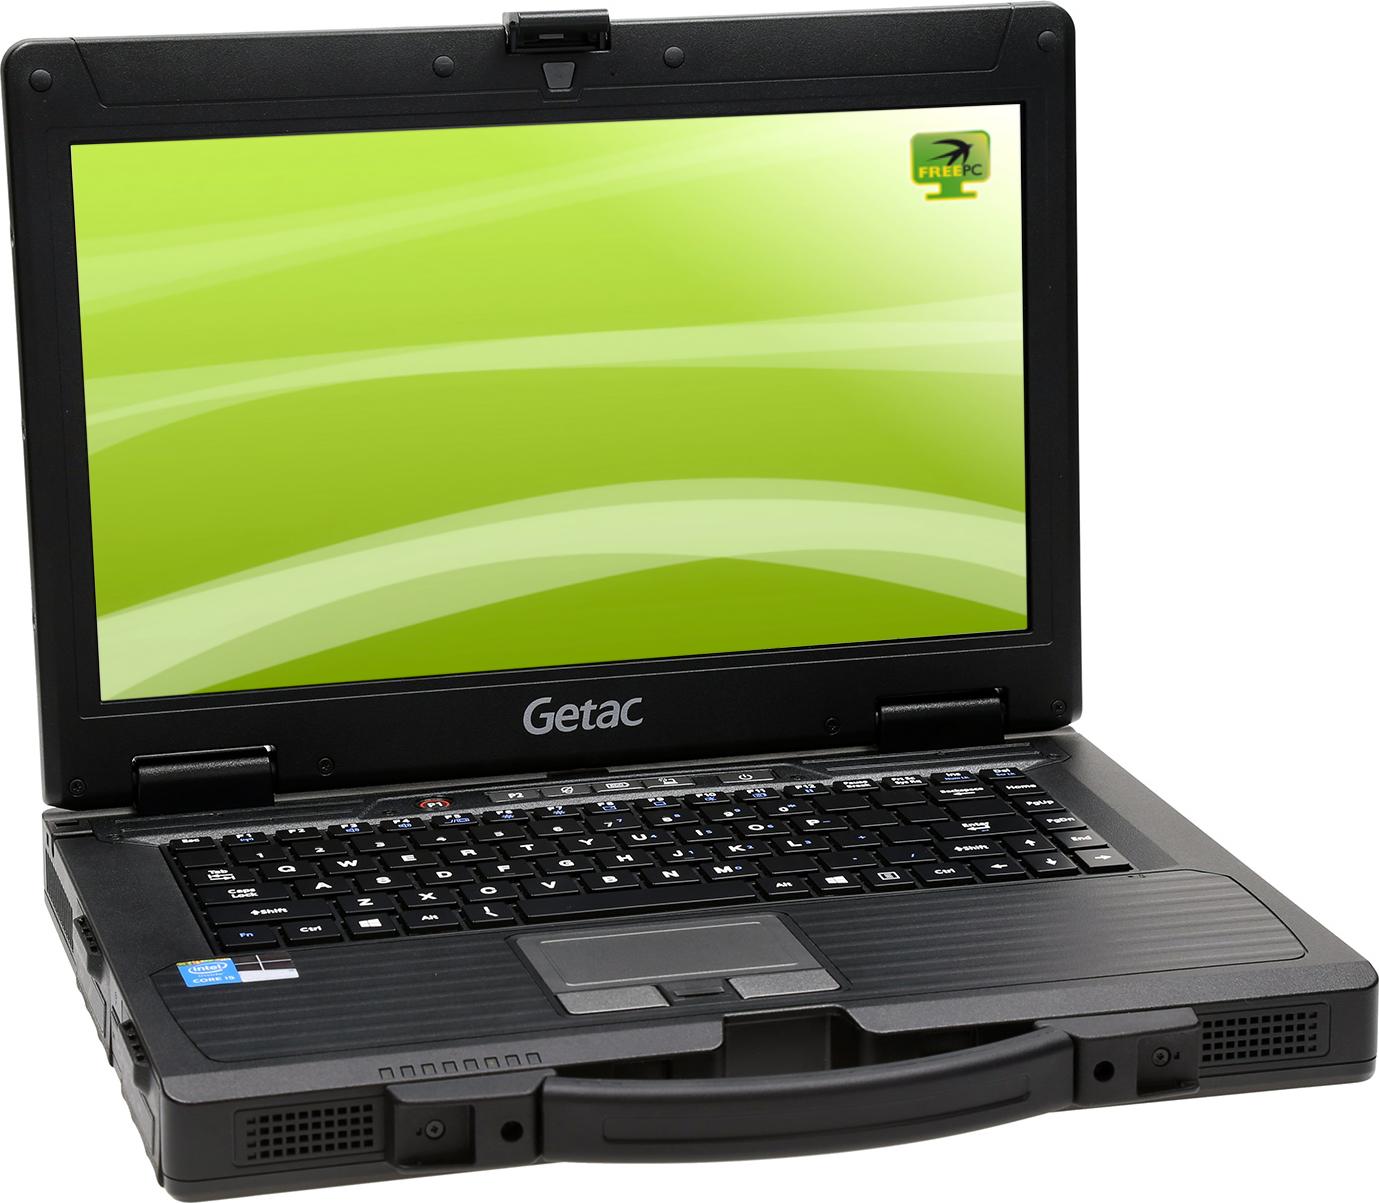 Getac  S400 G2